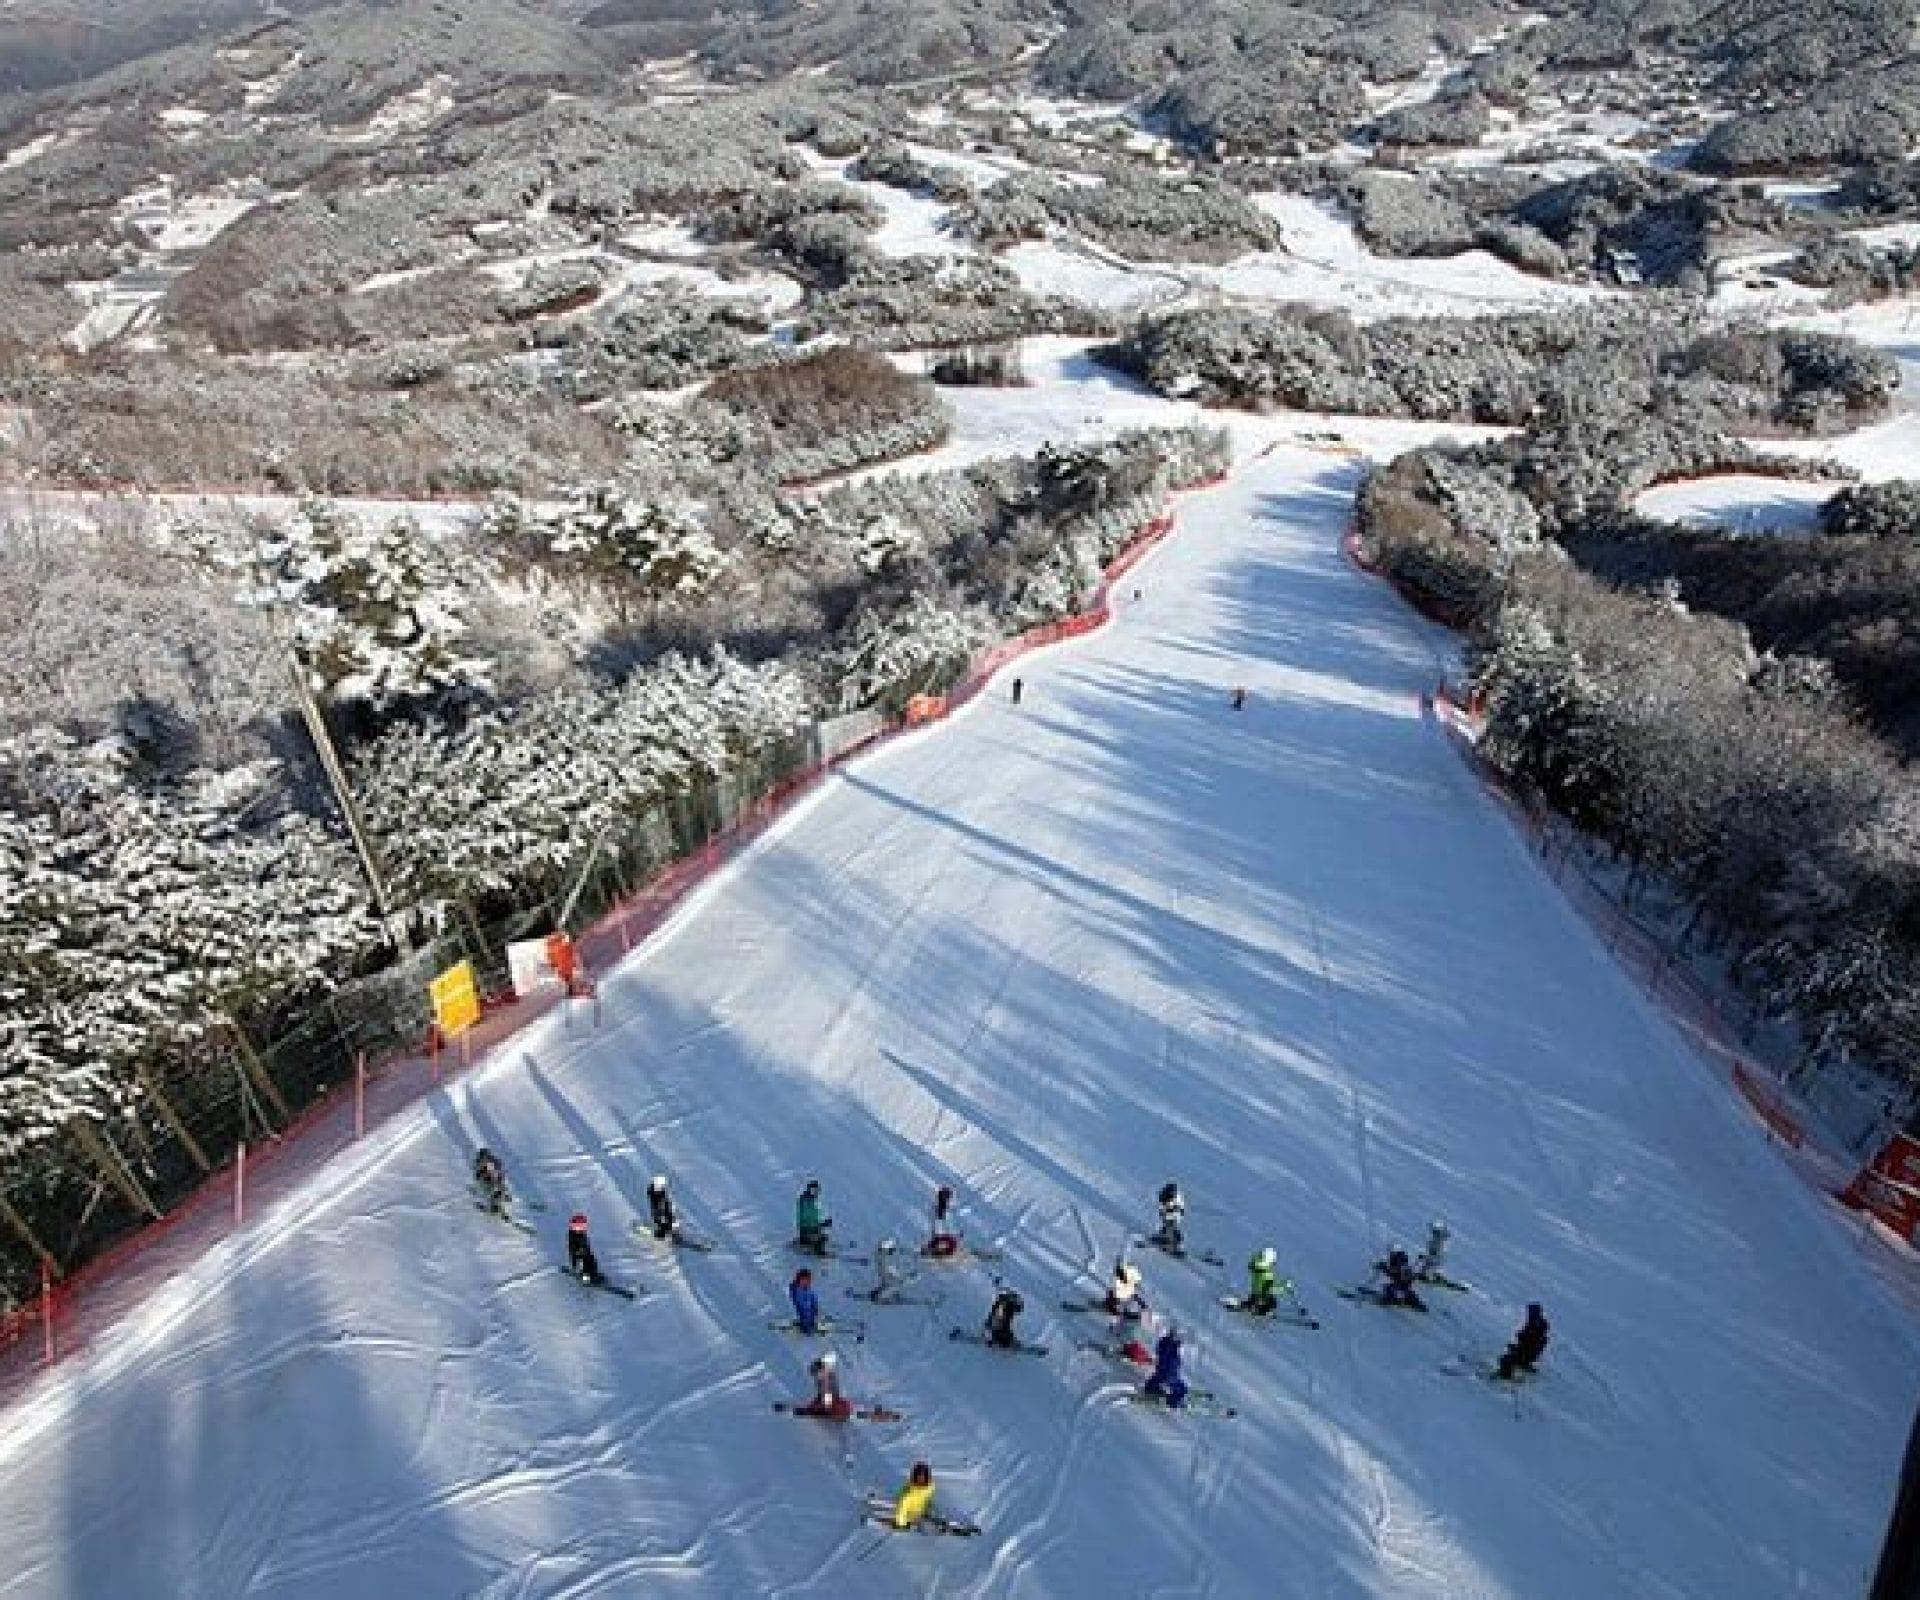 Welli Hilli Hyundai Ski Resort | Hoengseon, Gangwon-do